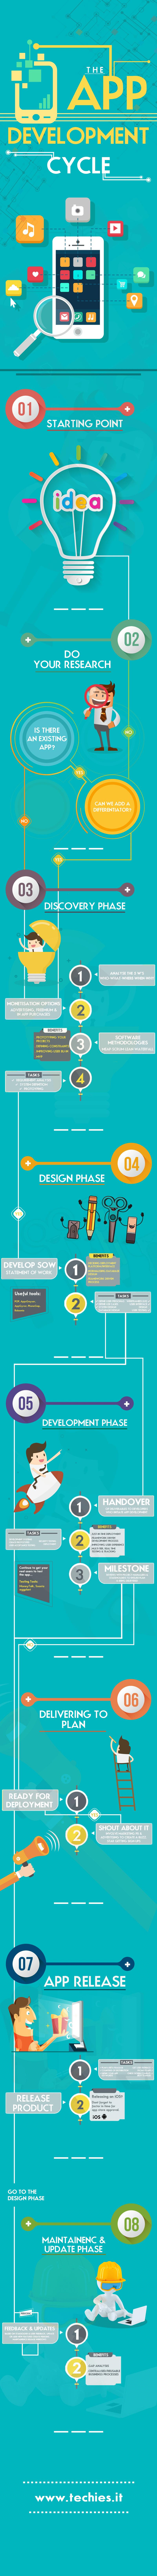 The App Development Cycle